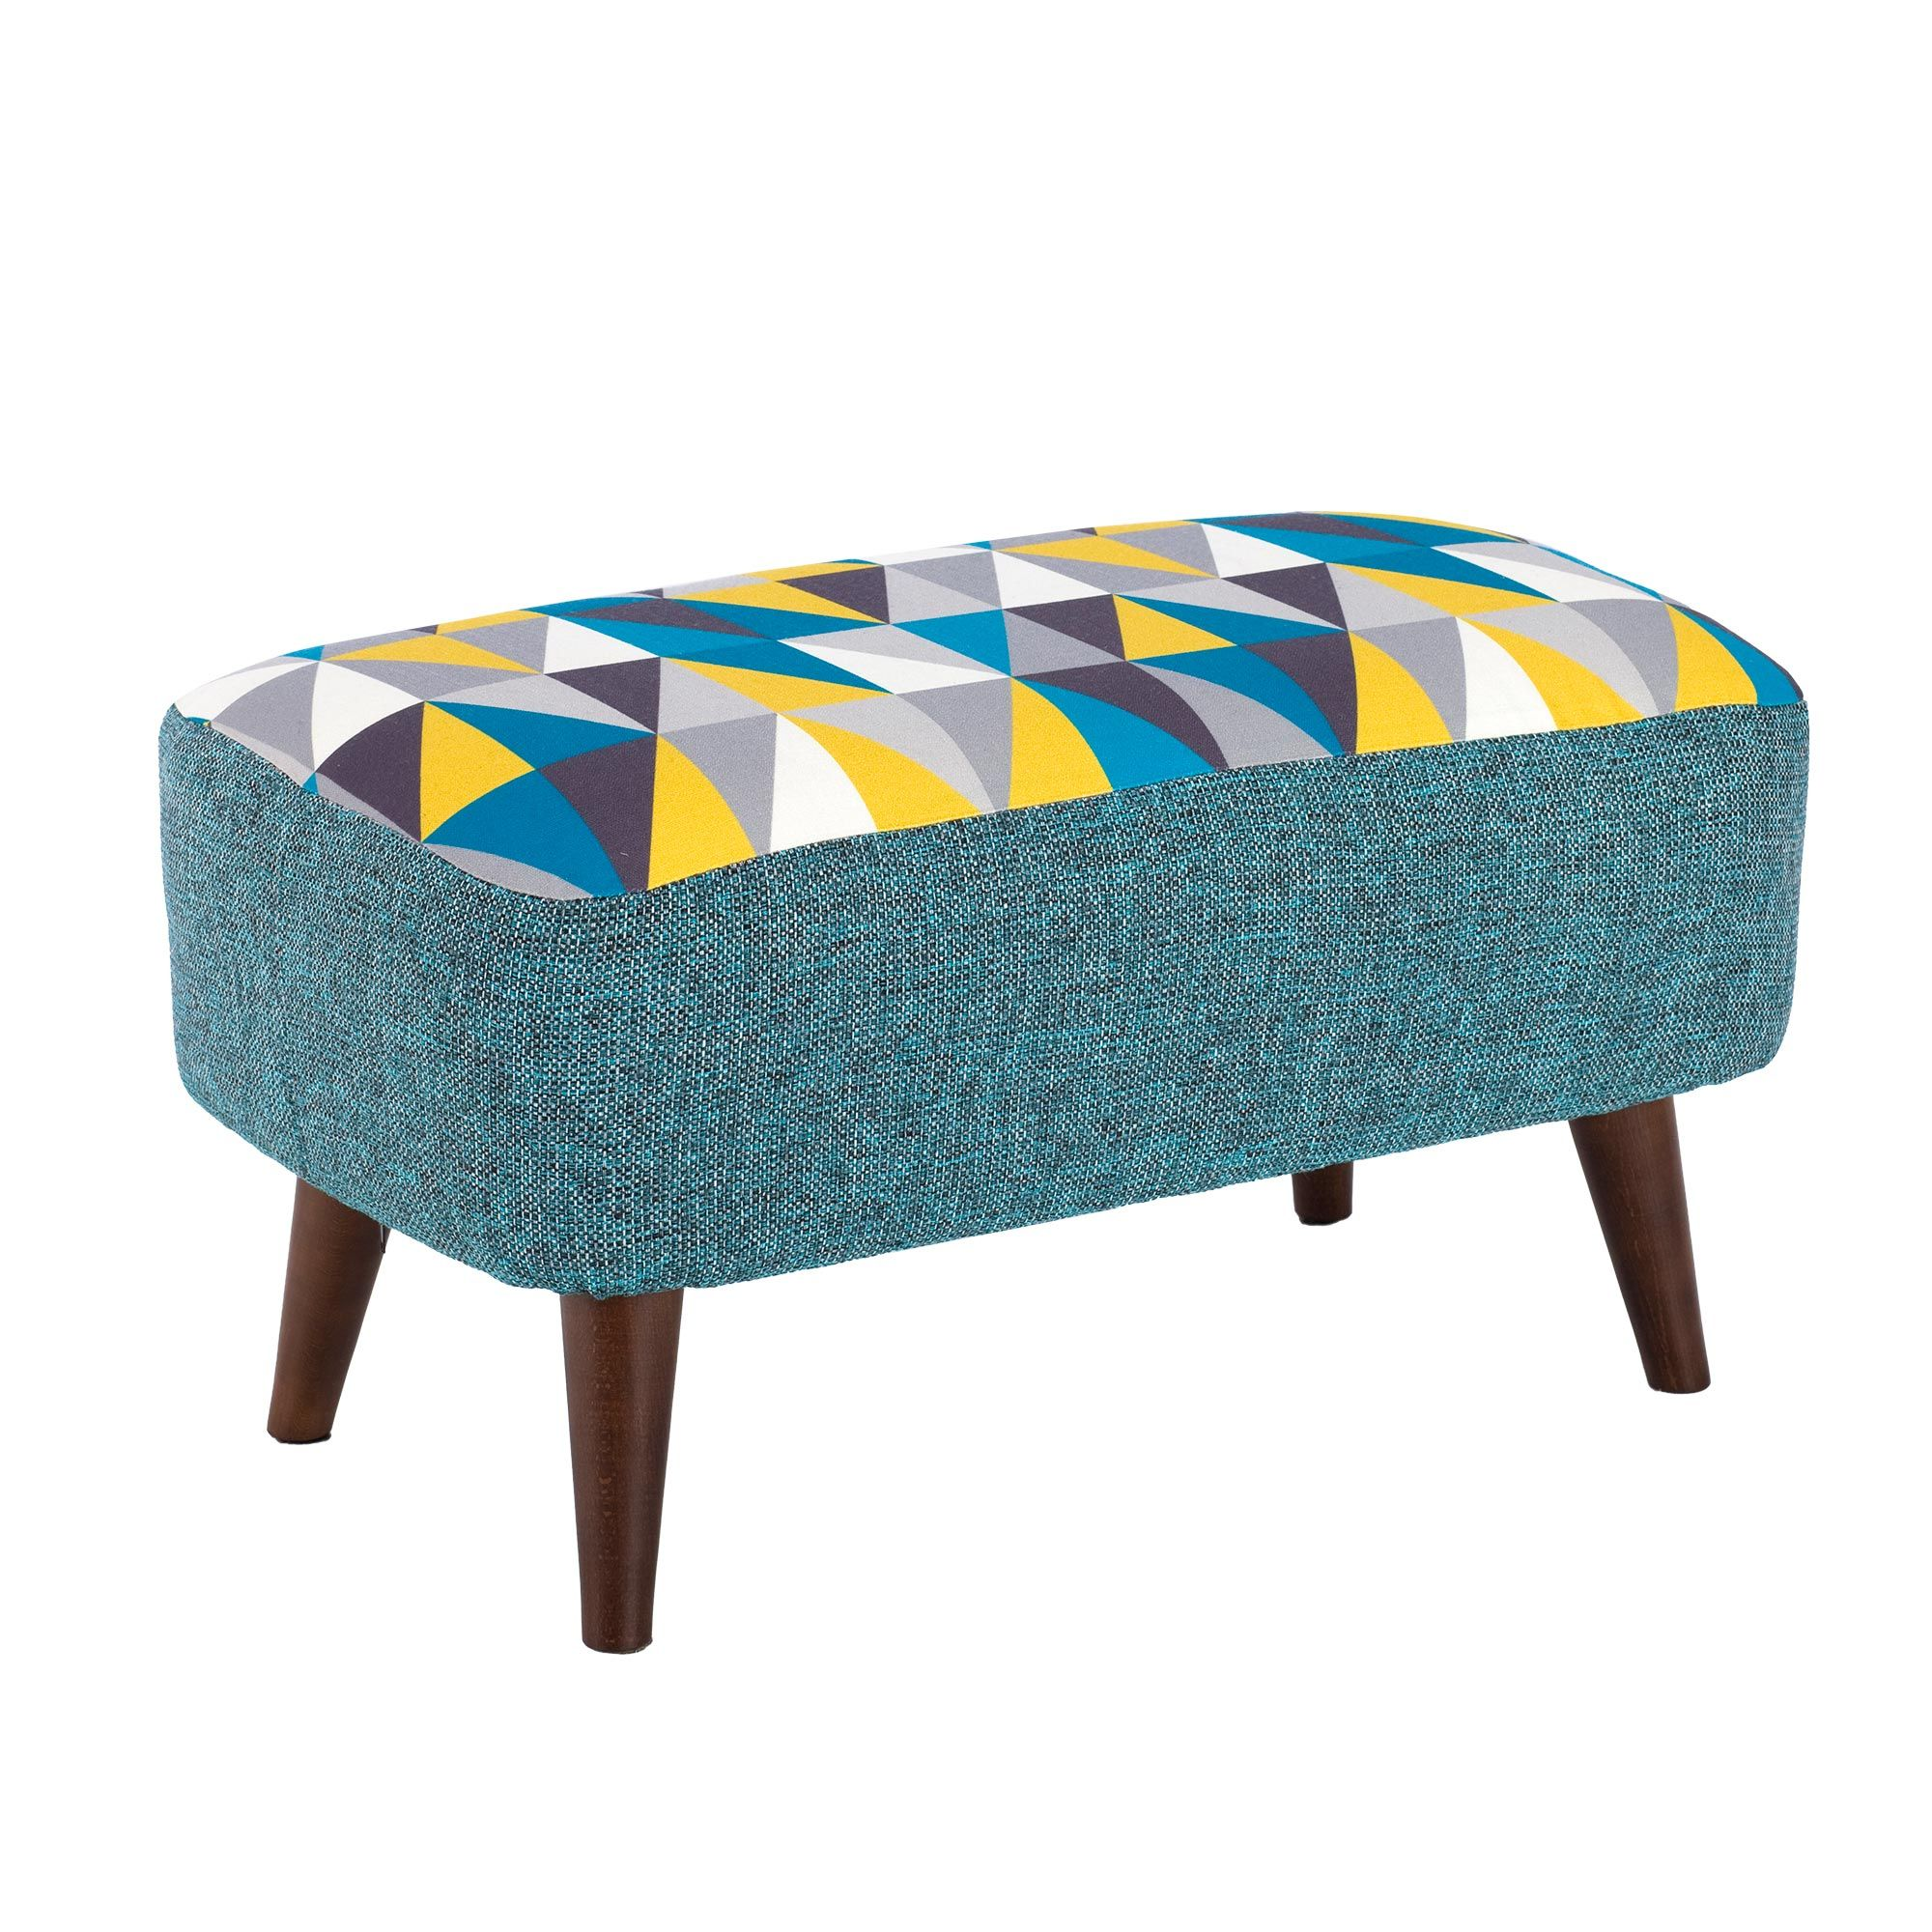 Juni Small Designer Bench Stool Footstools Barker Stonehouse In 2019 Bench Stool Upholstered Stool Stool